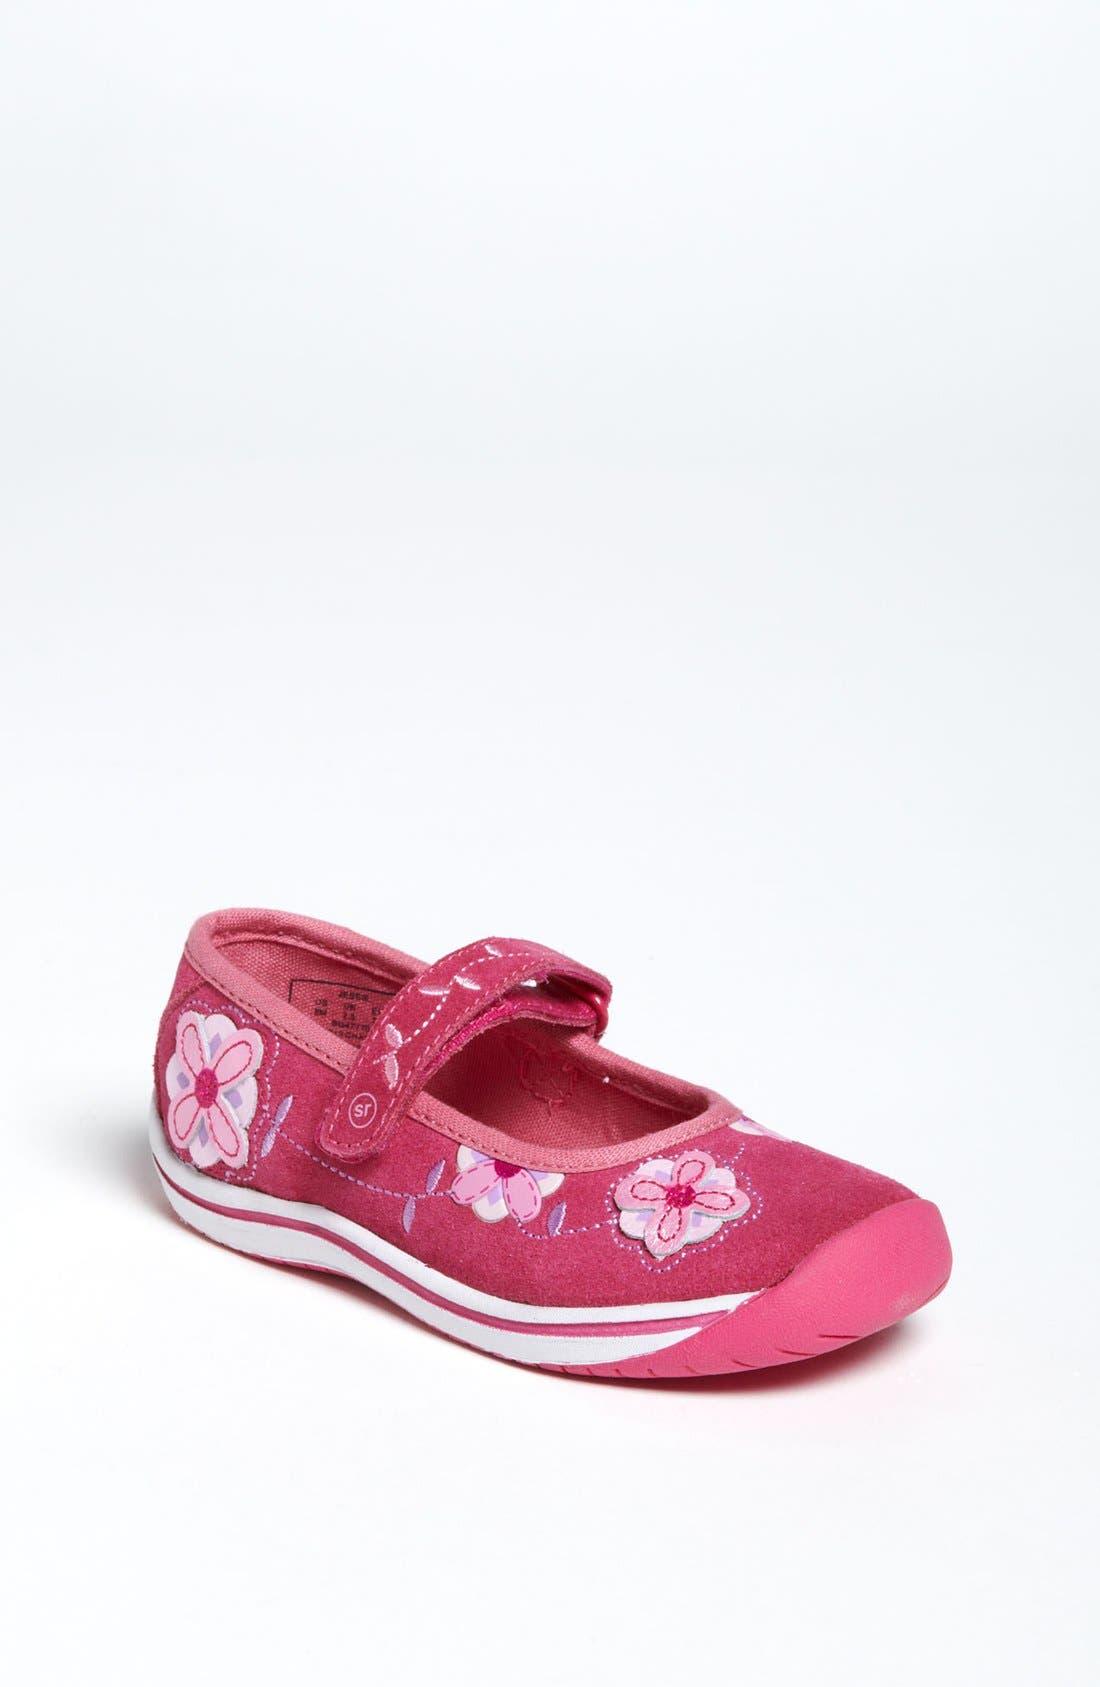 Alternate Image 1 Selected - Stride Rite 'Jessie' Mary Jane Sneaker (Baby, Walker & Toddler)